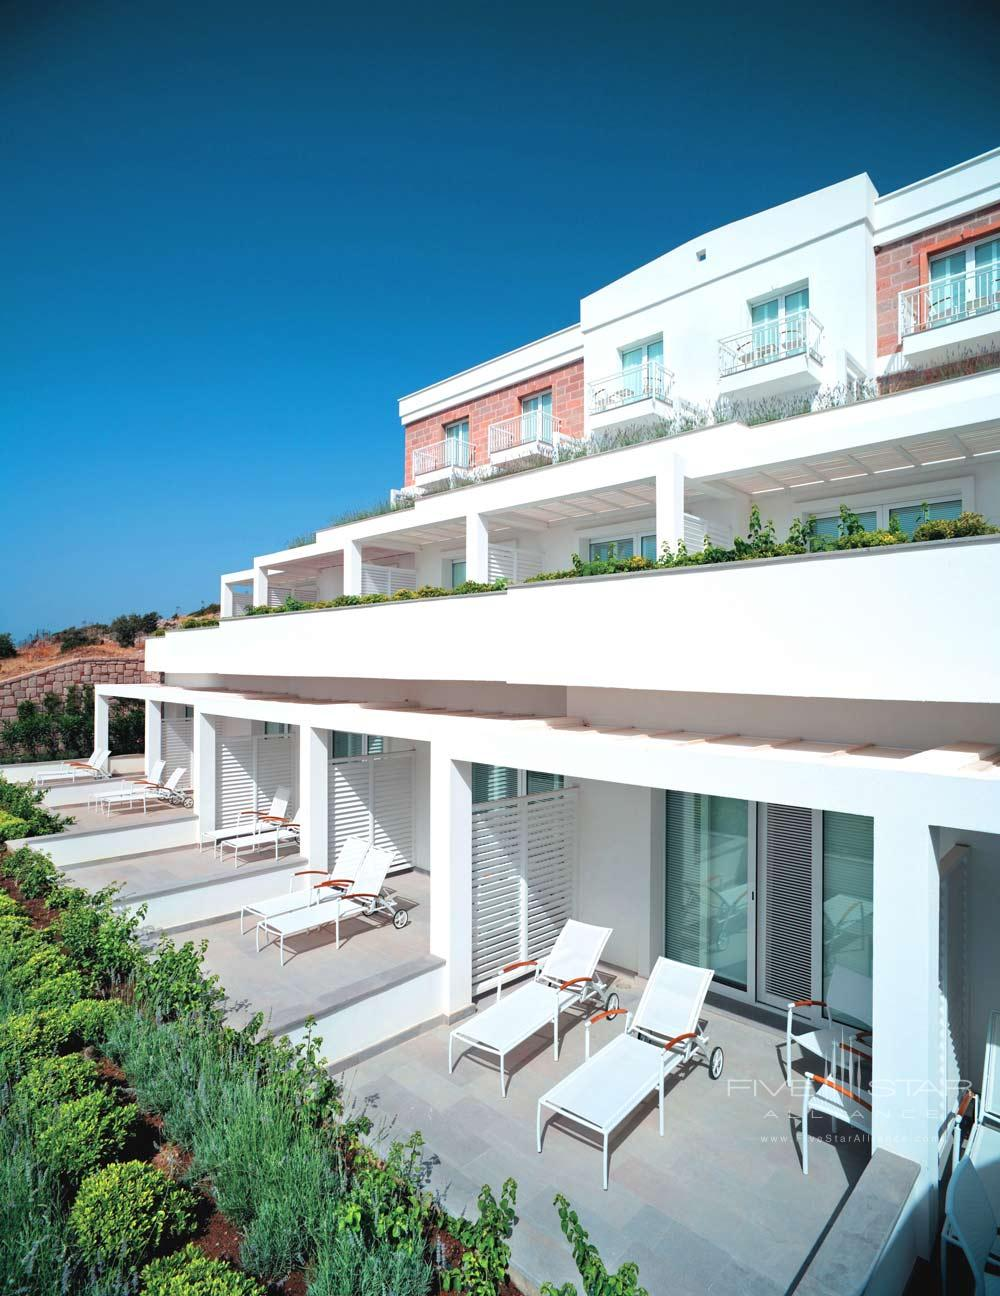 Grand Deluxe Sea Room Terrace View at Doria Hotel Bodrum, Turkey